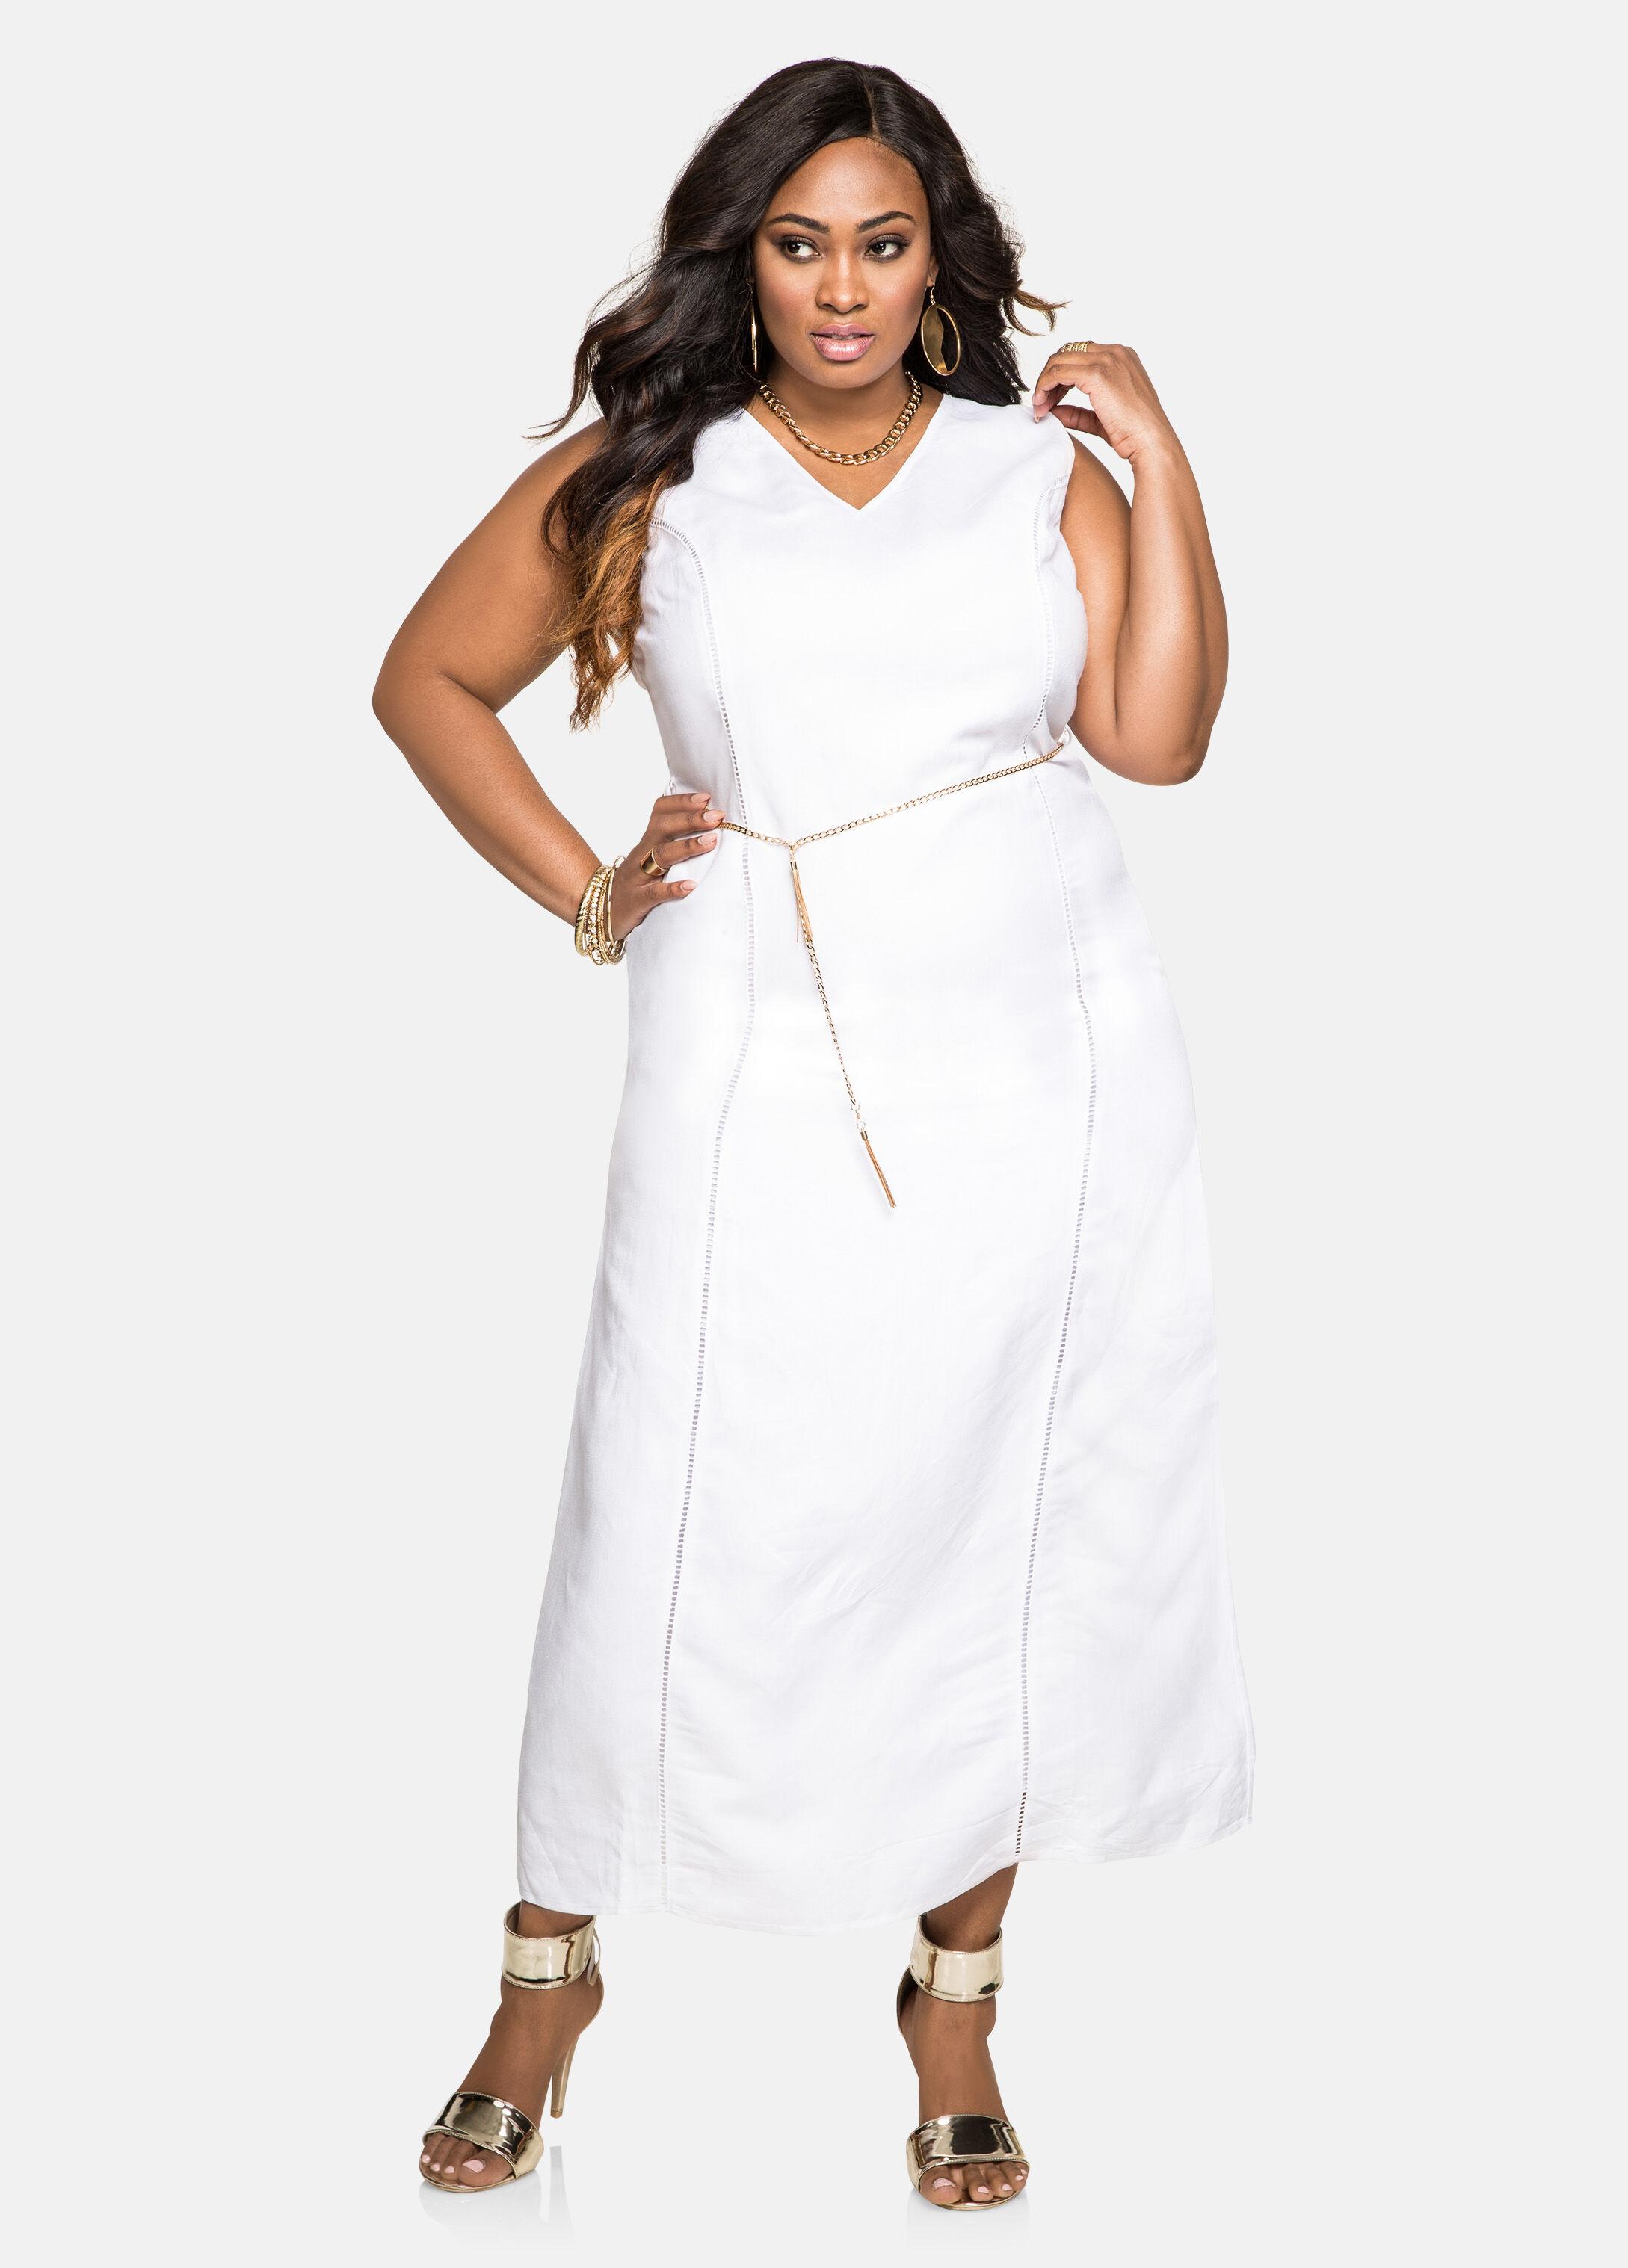 Buy Plus Size White Linen Dresses - Ashley Stewart